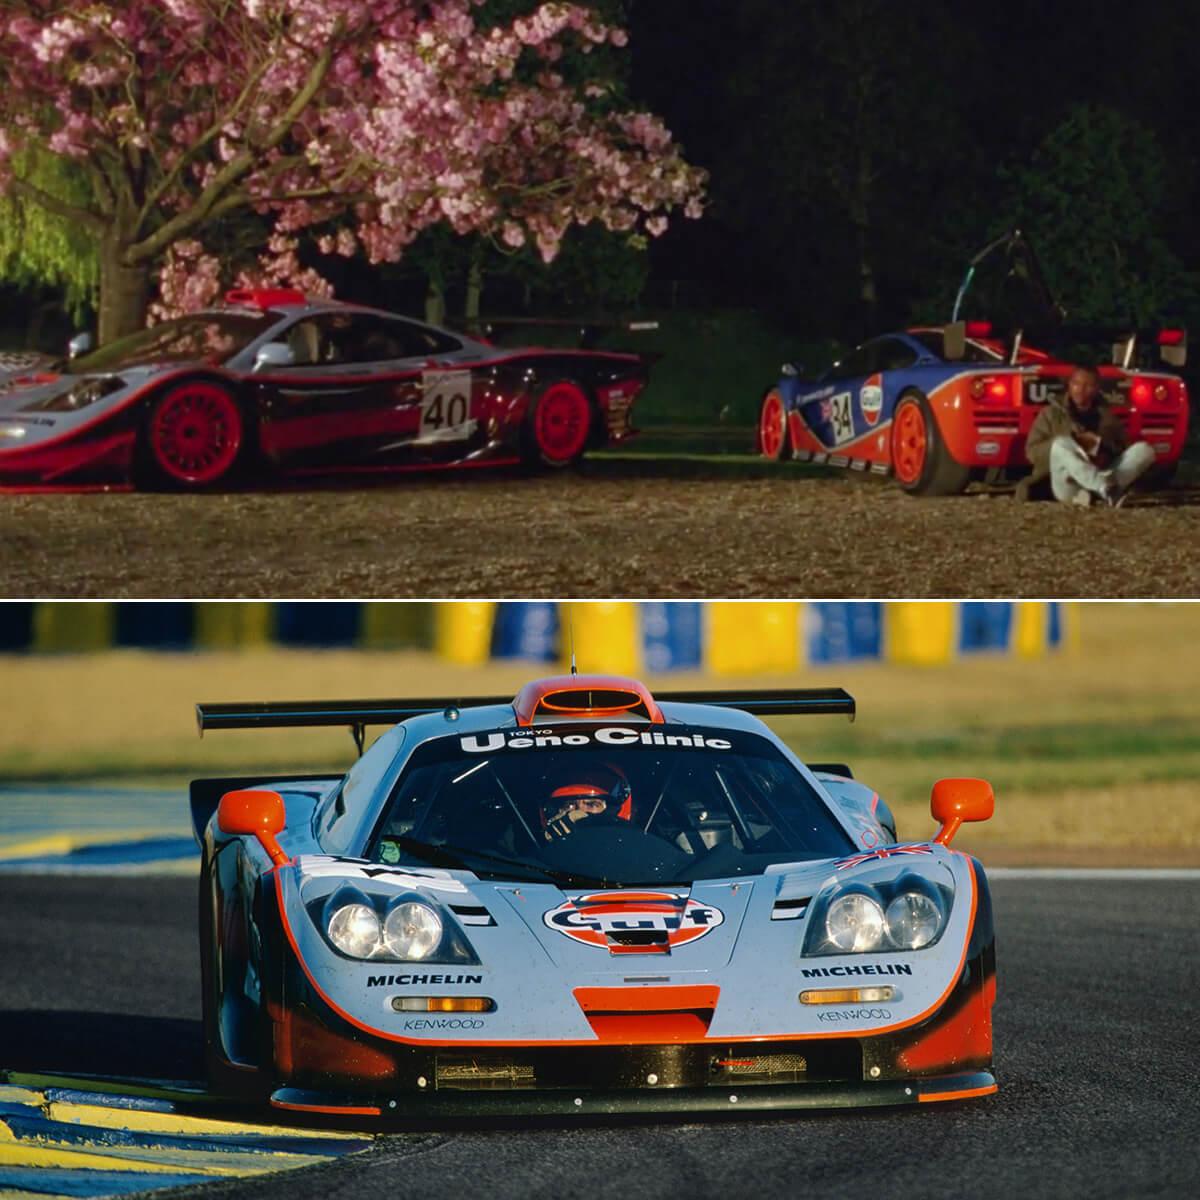 McLaren F1 GTR Longtail (Ueno Clinic Gulf Livery)